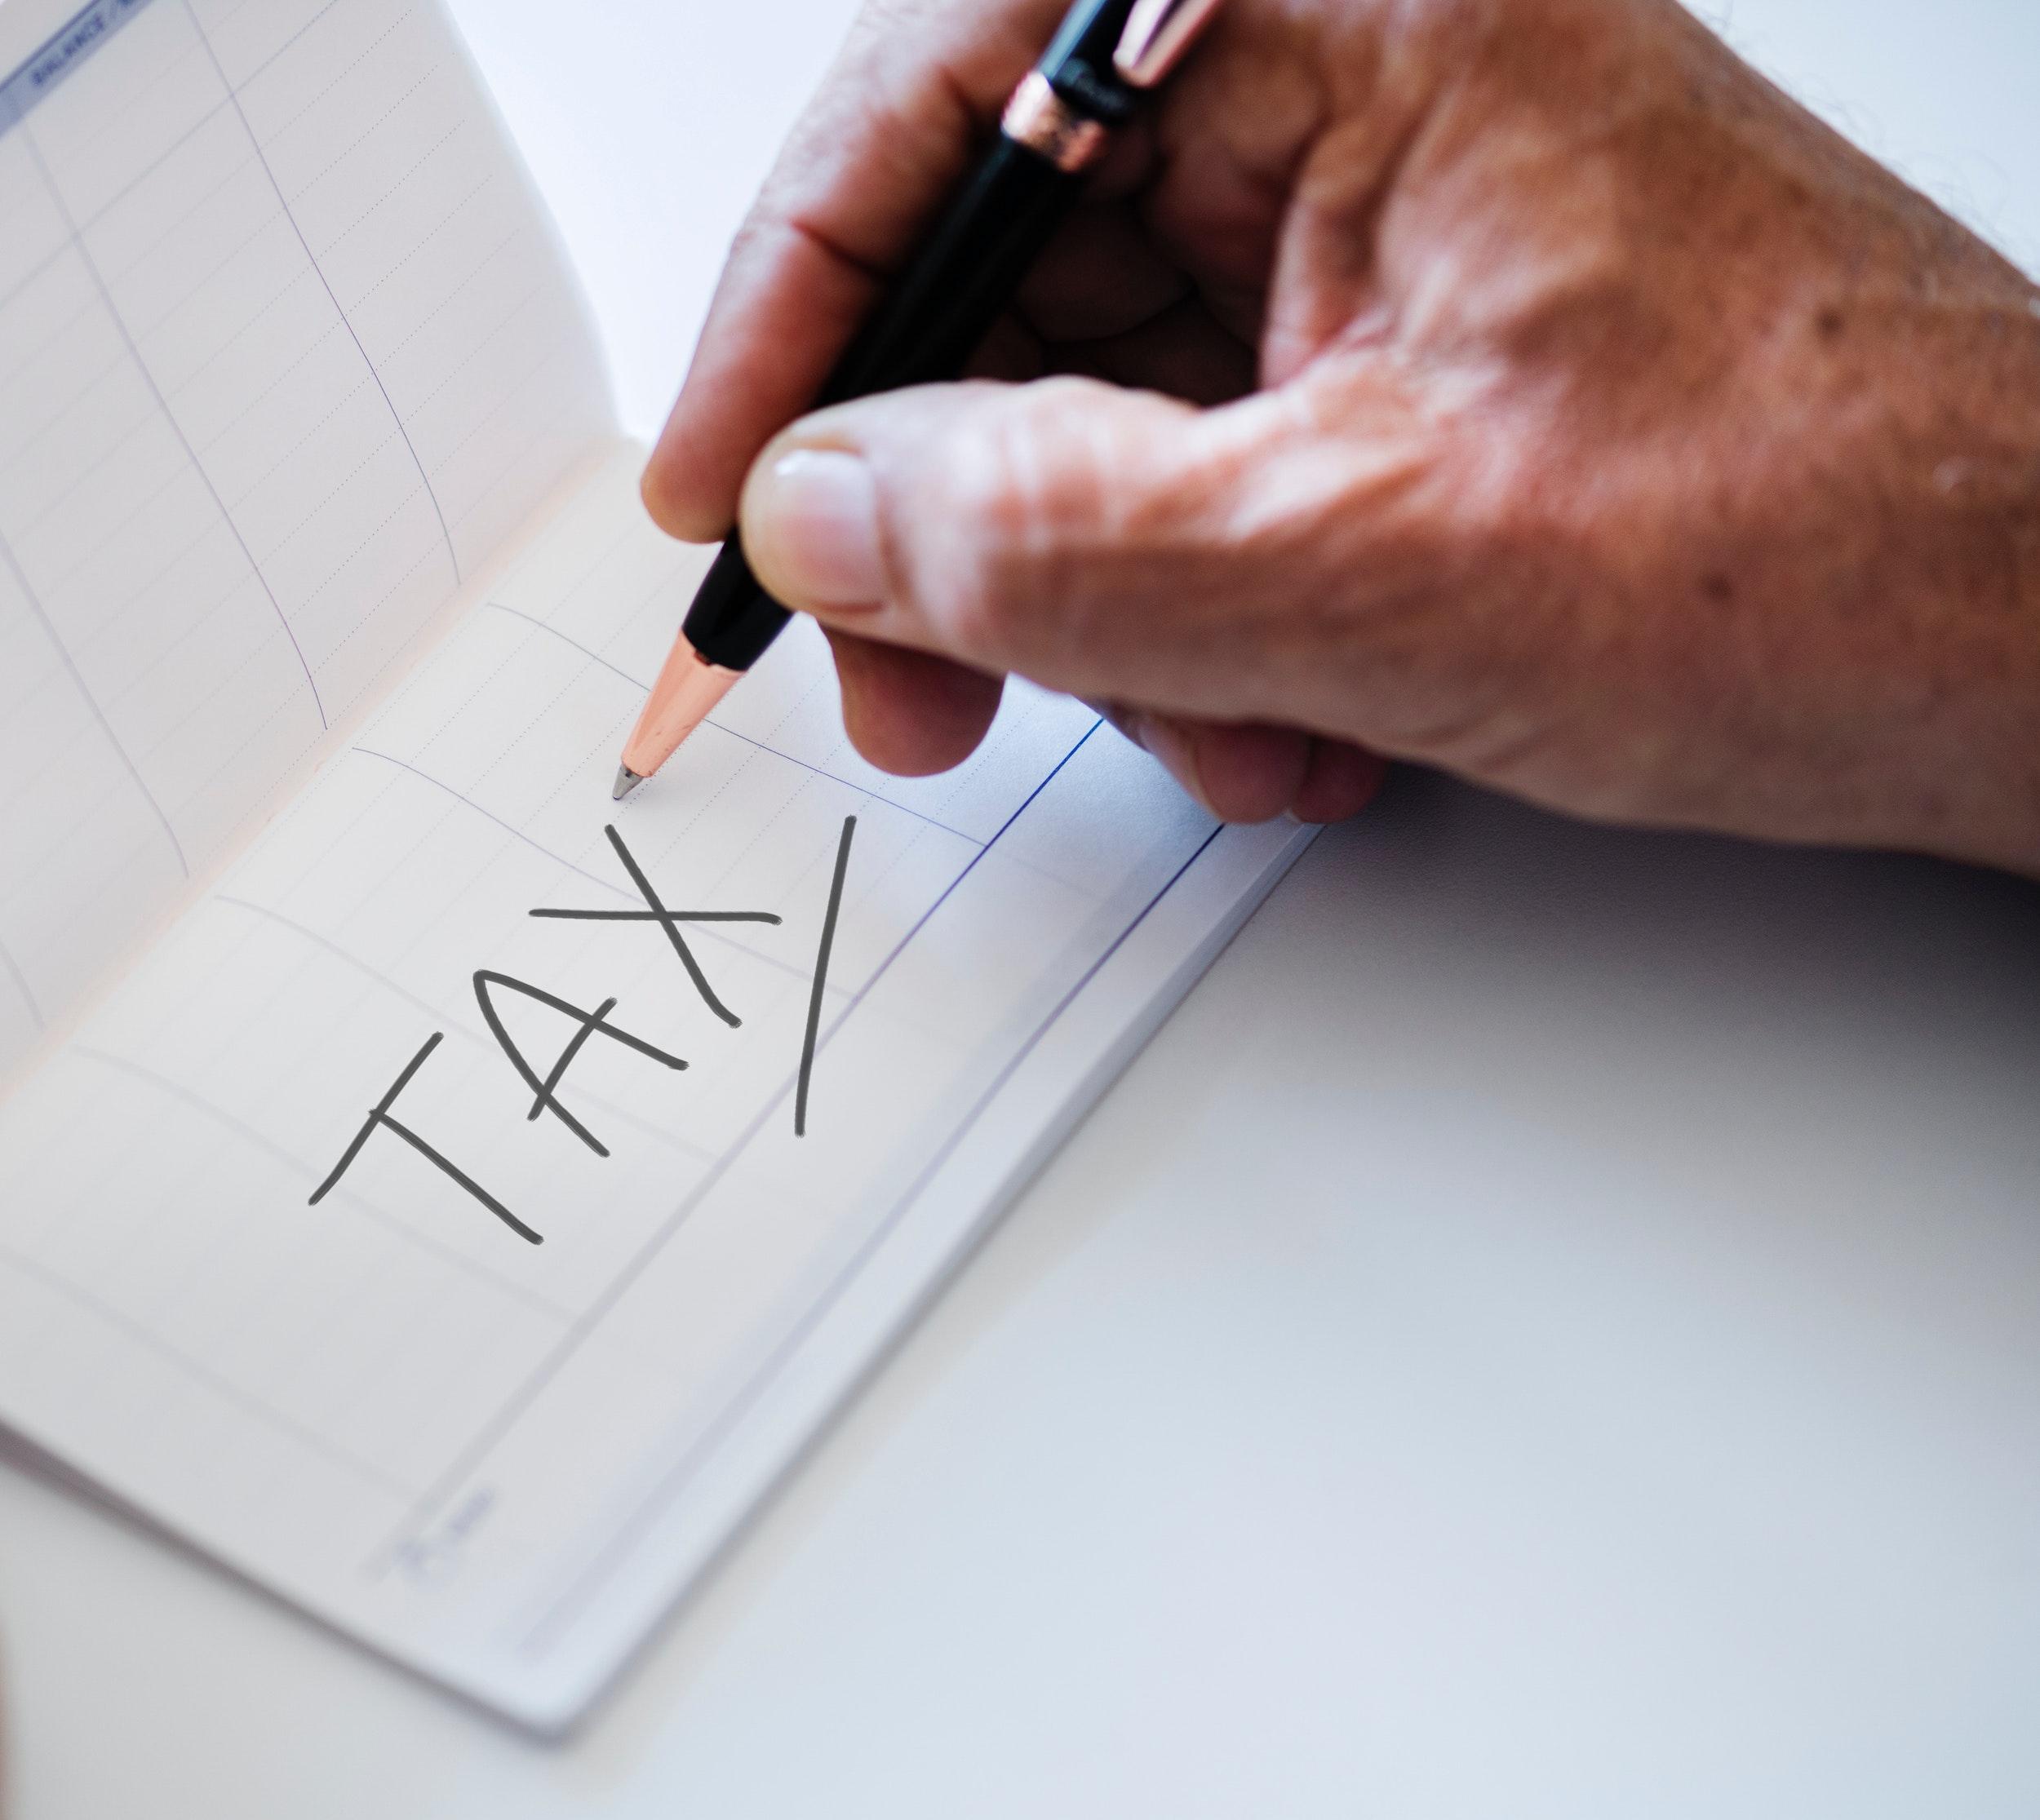 accounting-finance-hand-921783.jpg